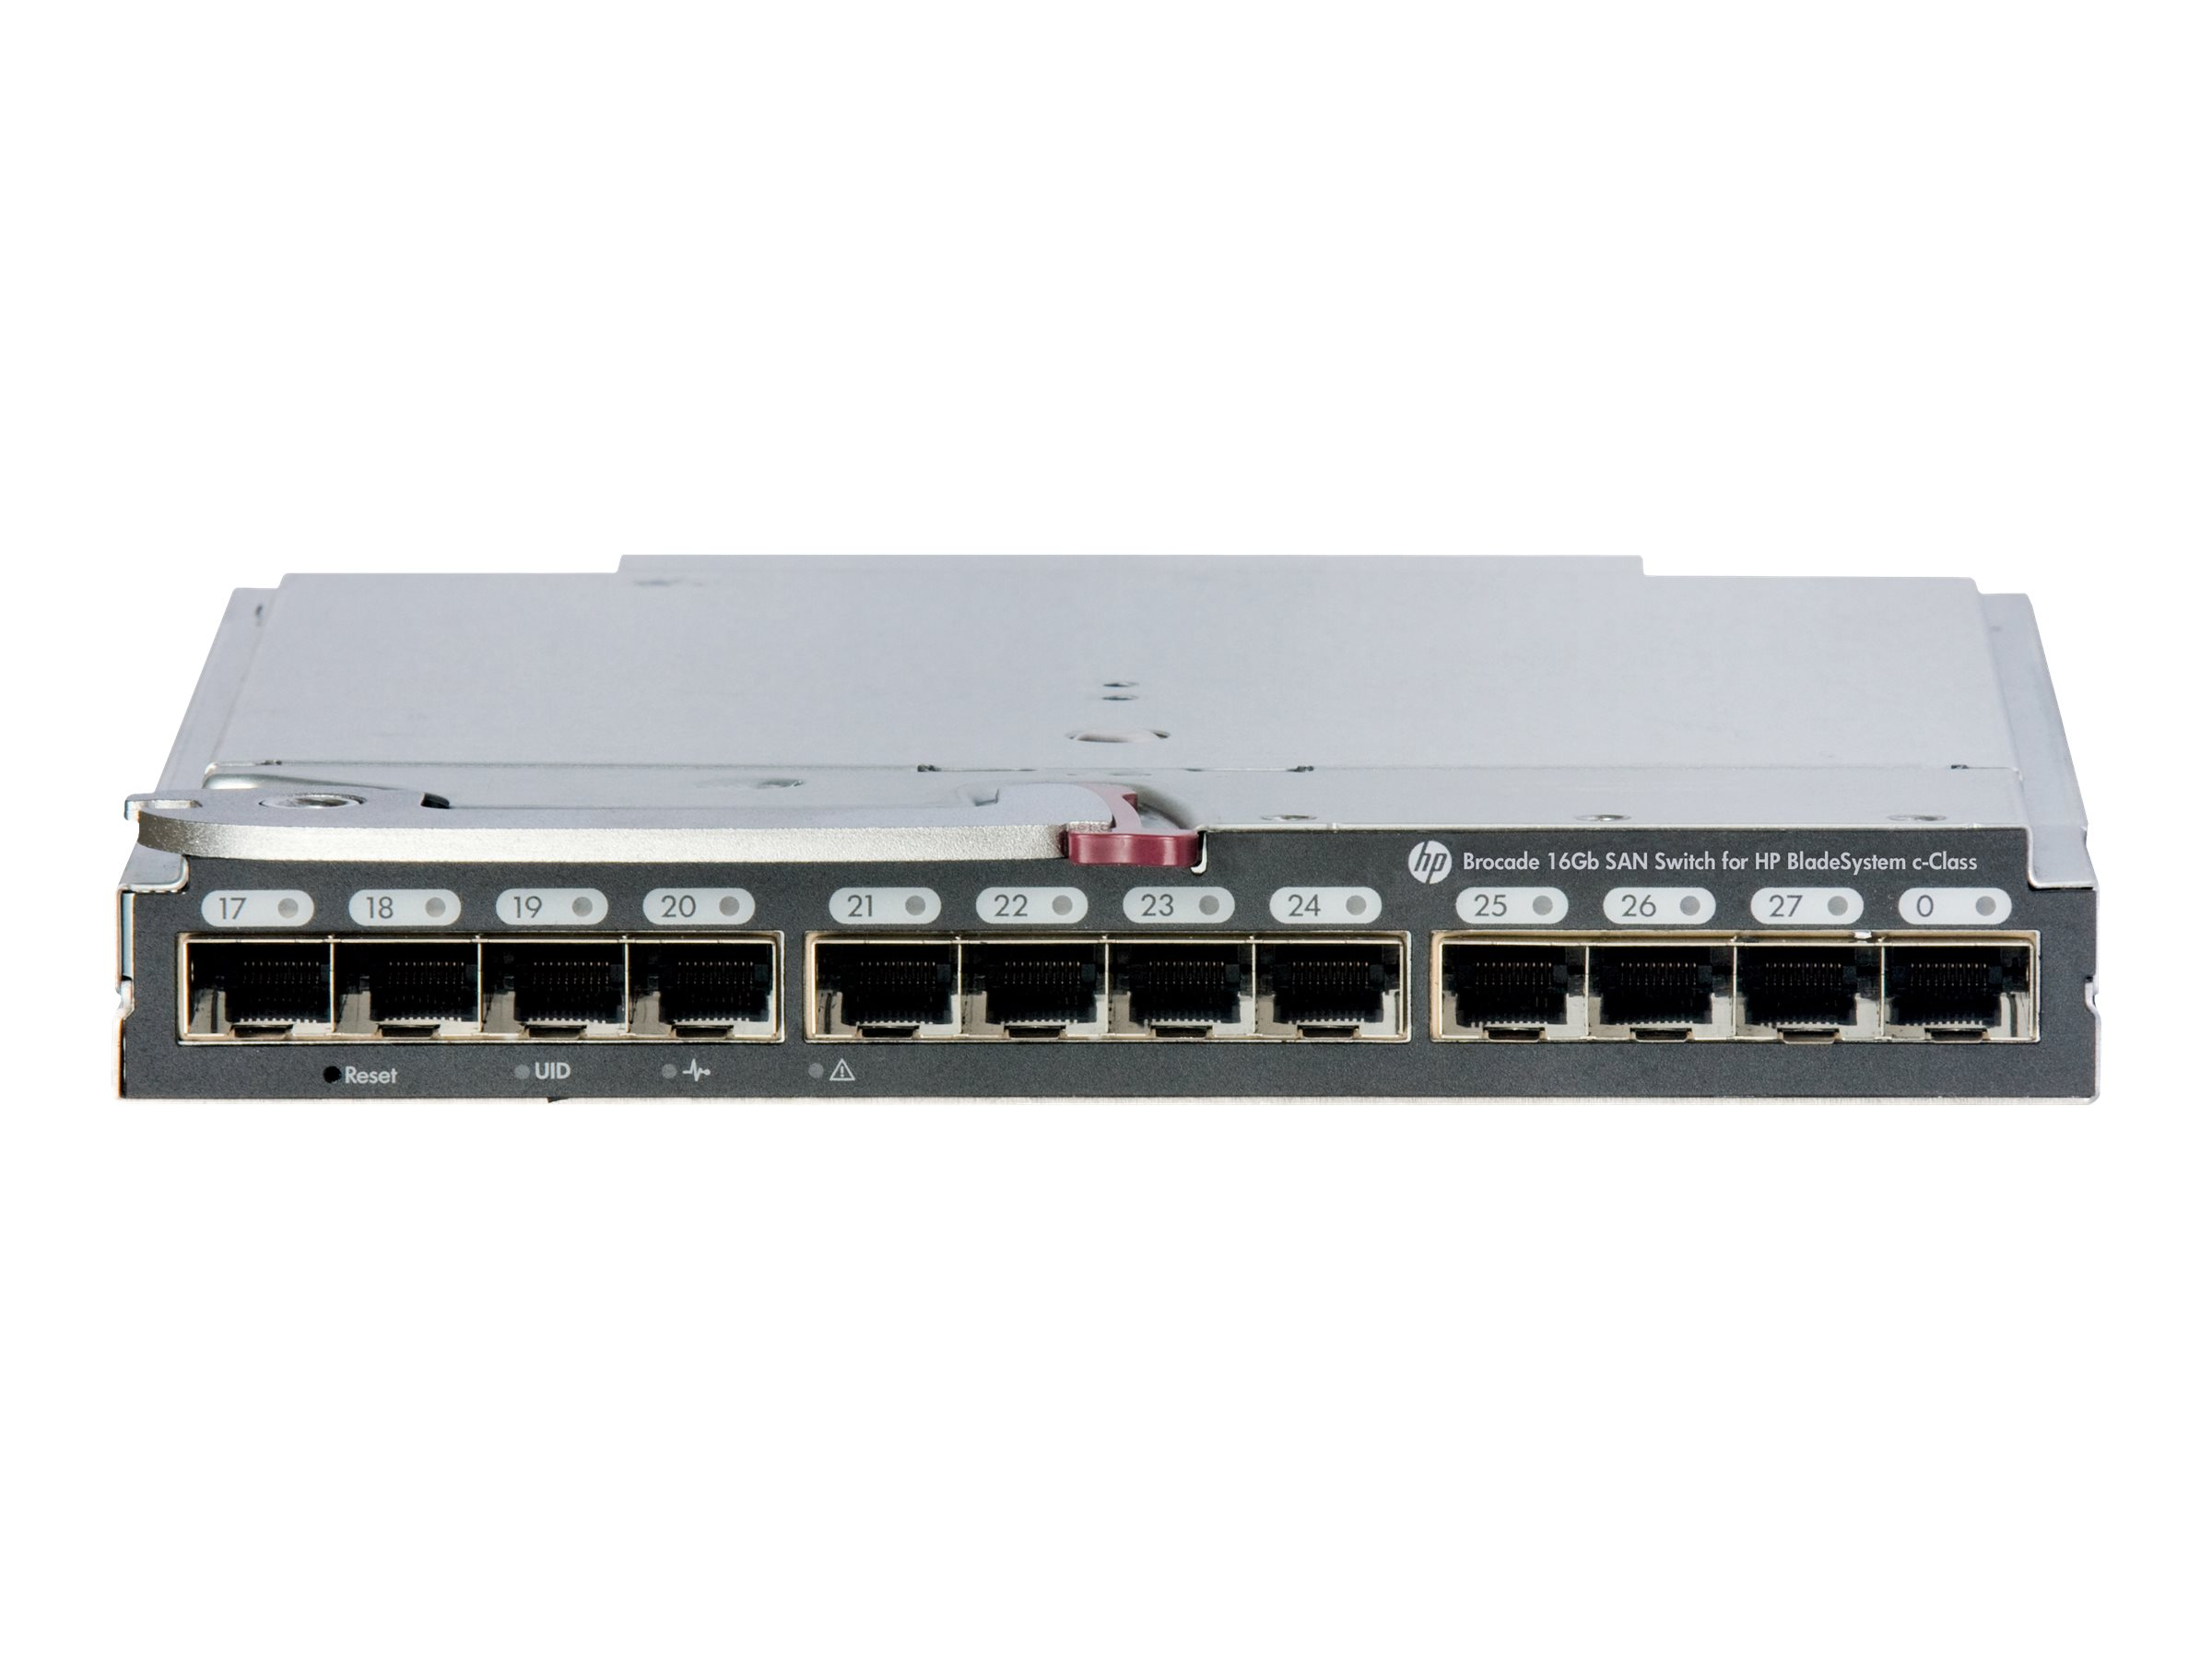 [Wiederaufbereitet] Brocade 16Gb/28 SAN Switch for HP BladeSystem c-Class - Switch - managed - 16 x 16Gb Fibre Channel (intern)